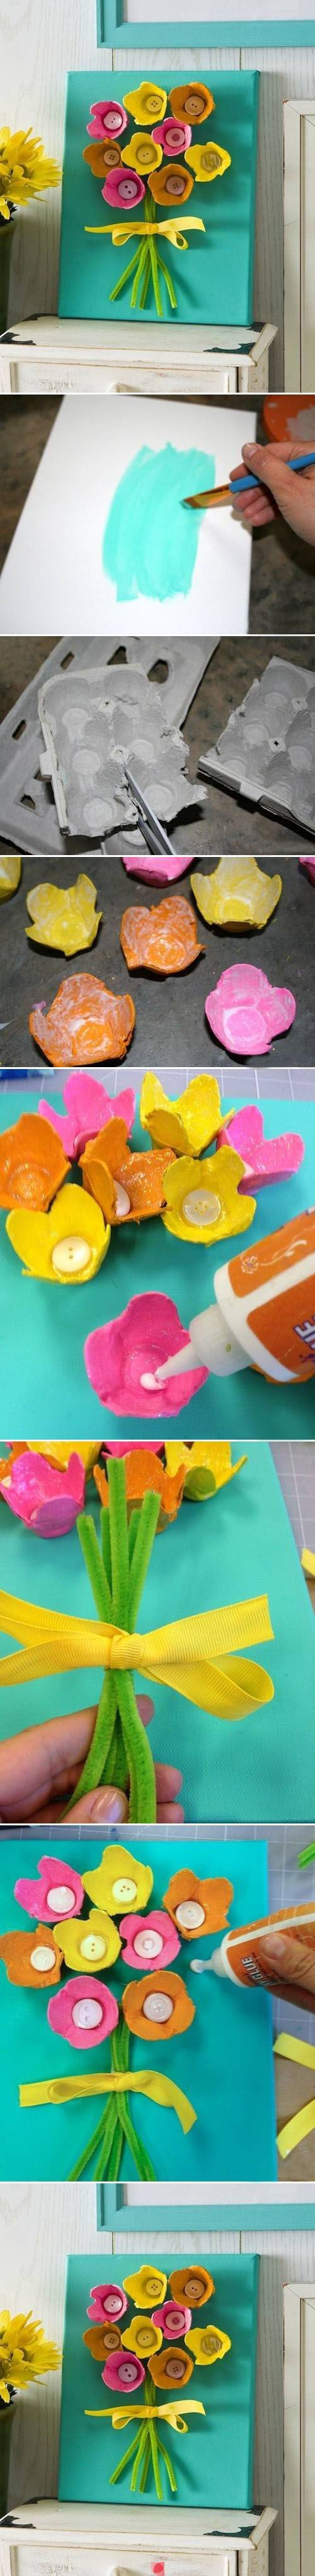 Creativas manualidades con cartón de huevos | Aprender manualidades es facilisimo.com